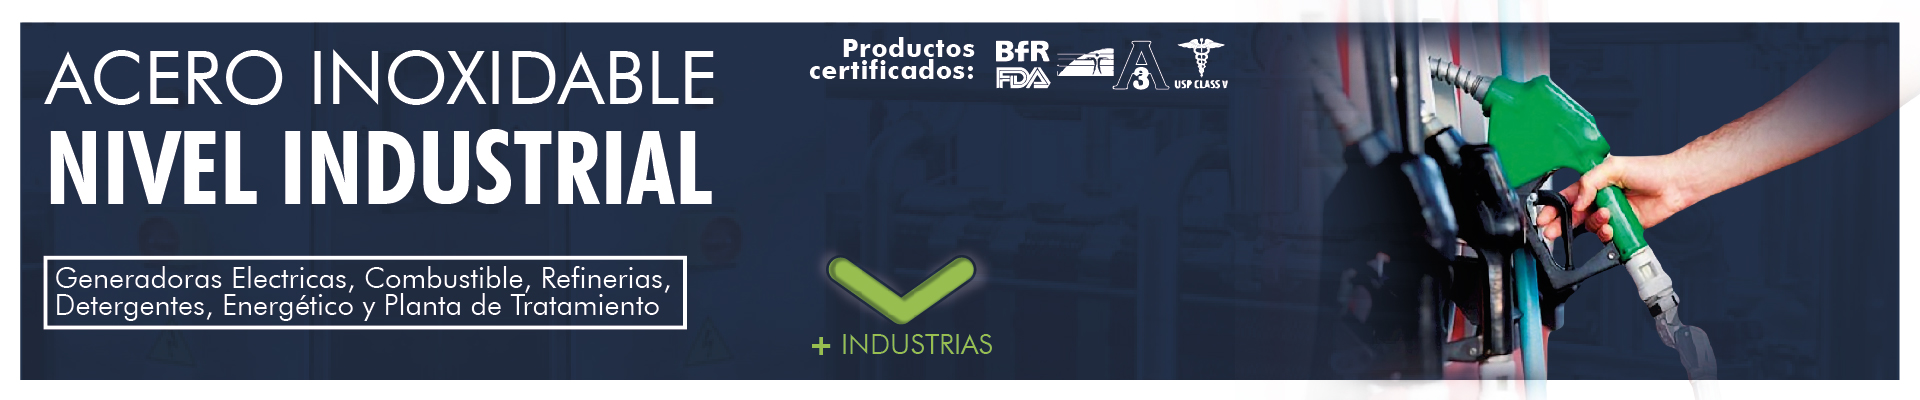 Nivel Industrial